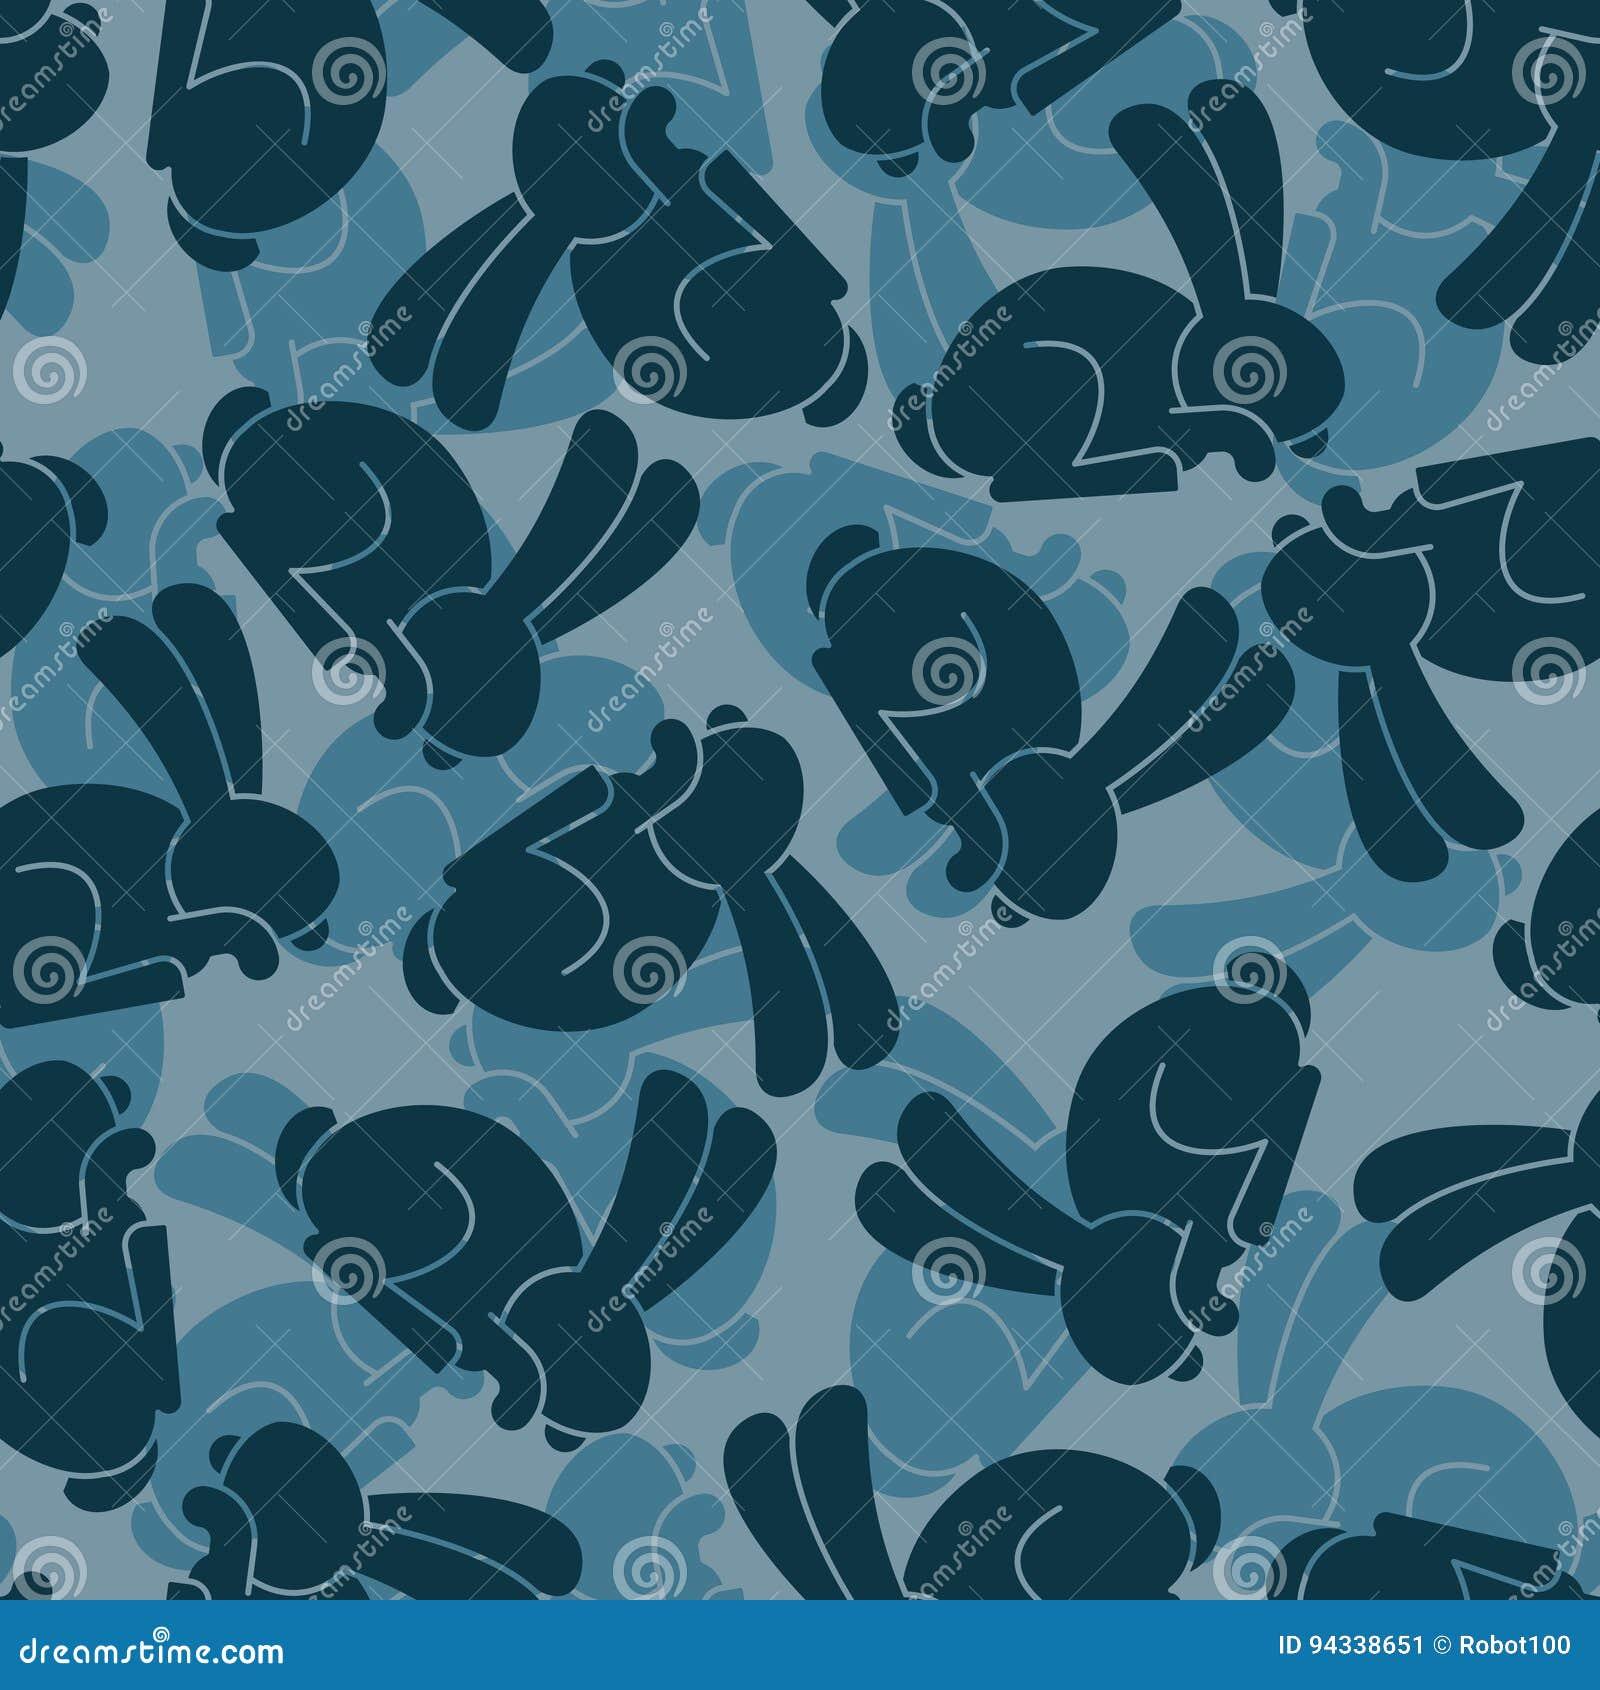 Military Texture Rabbit Army Bunny Seamless Texture